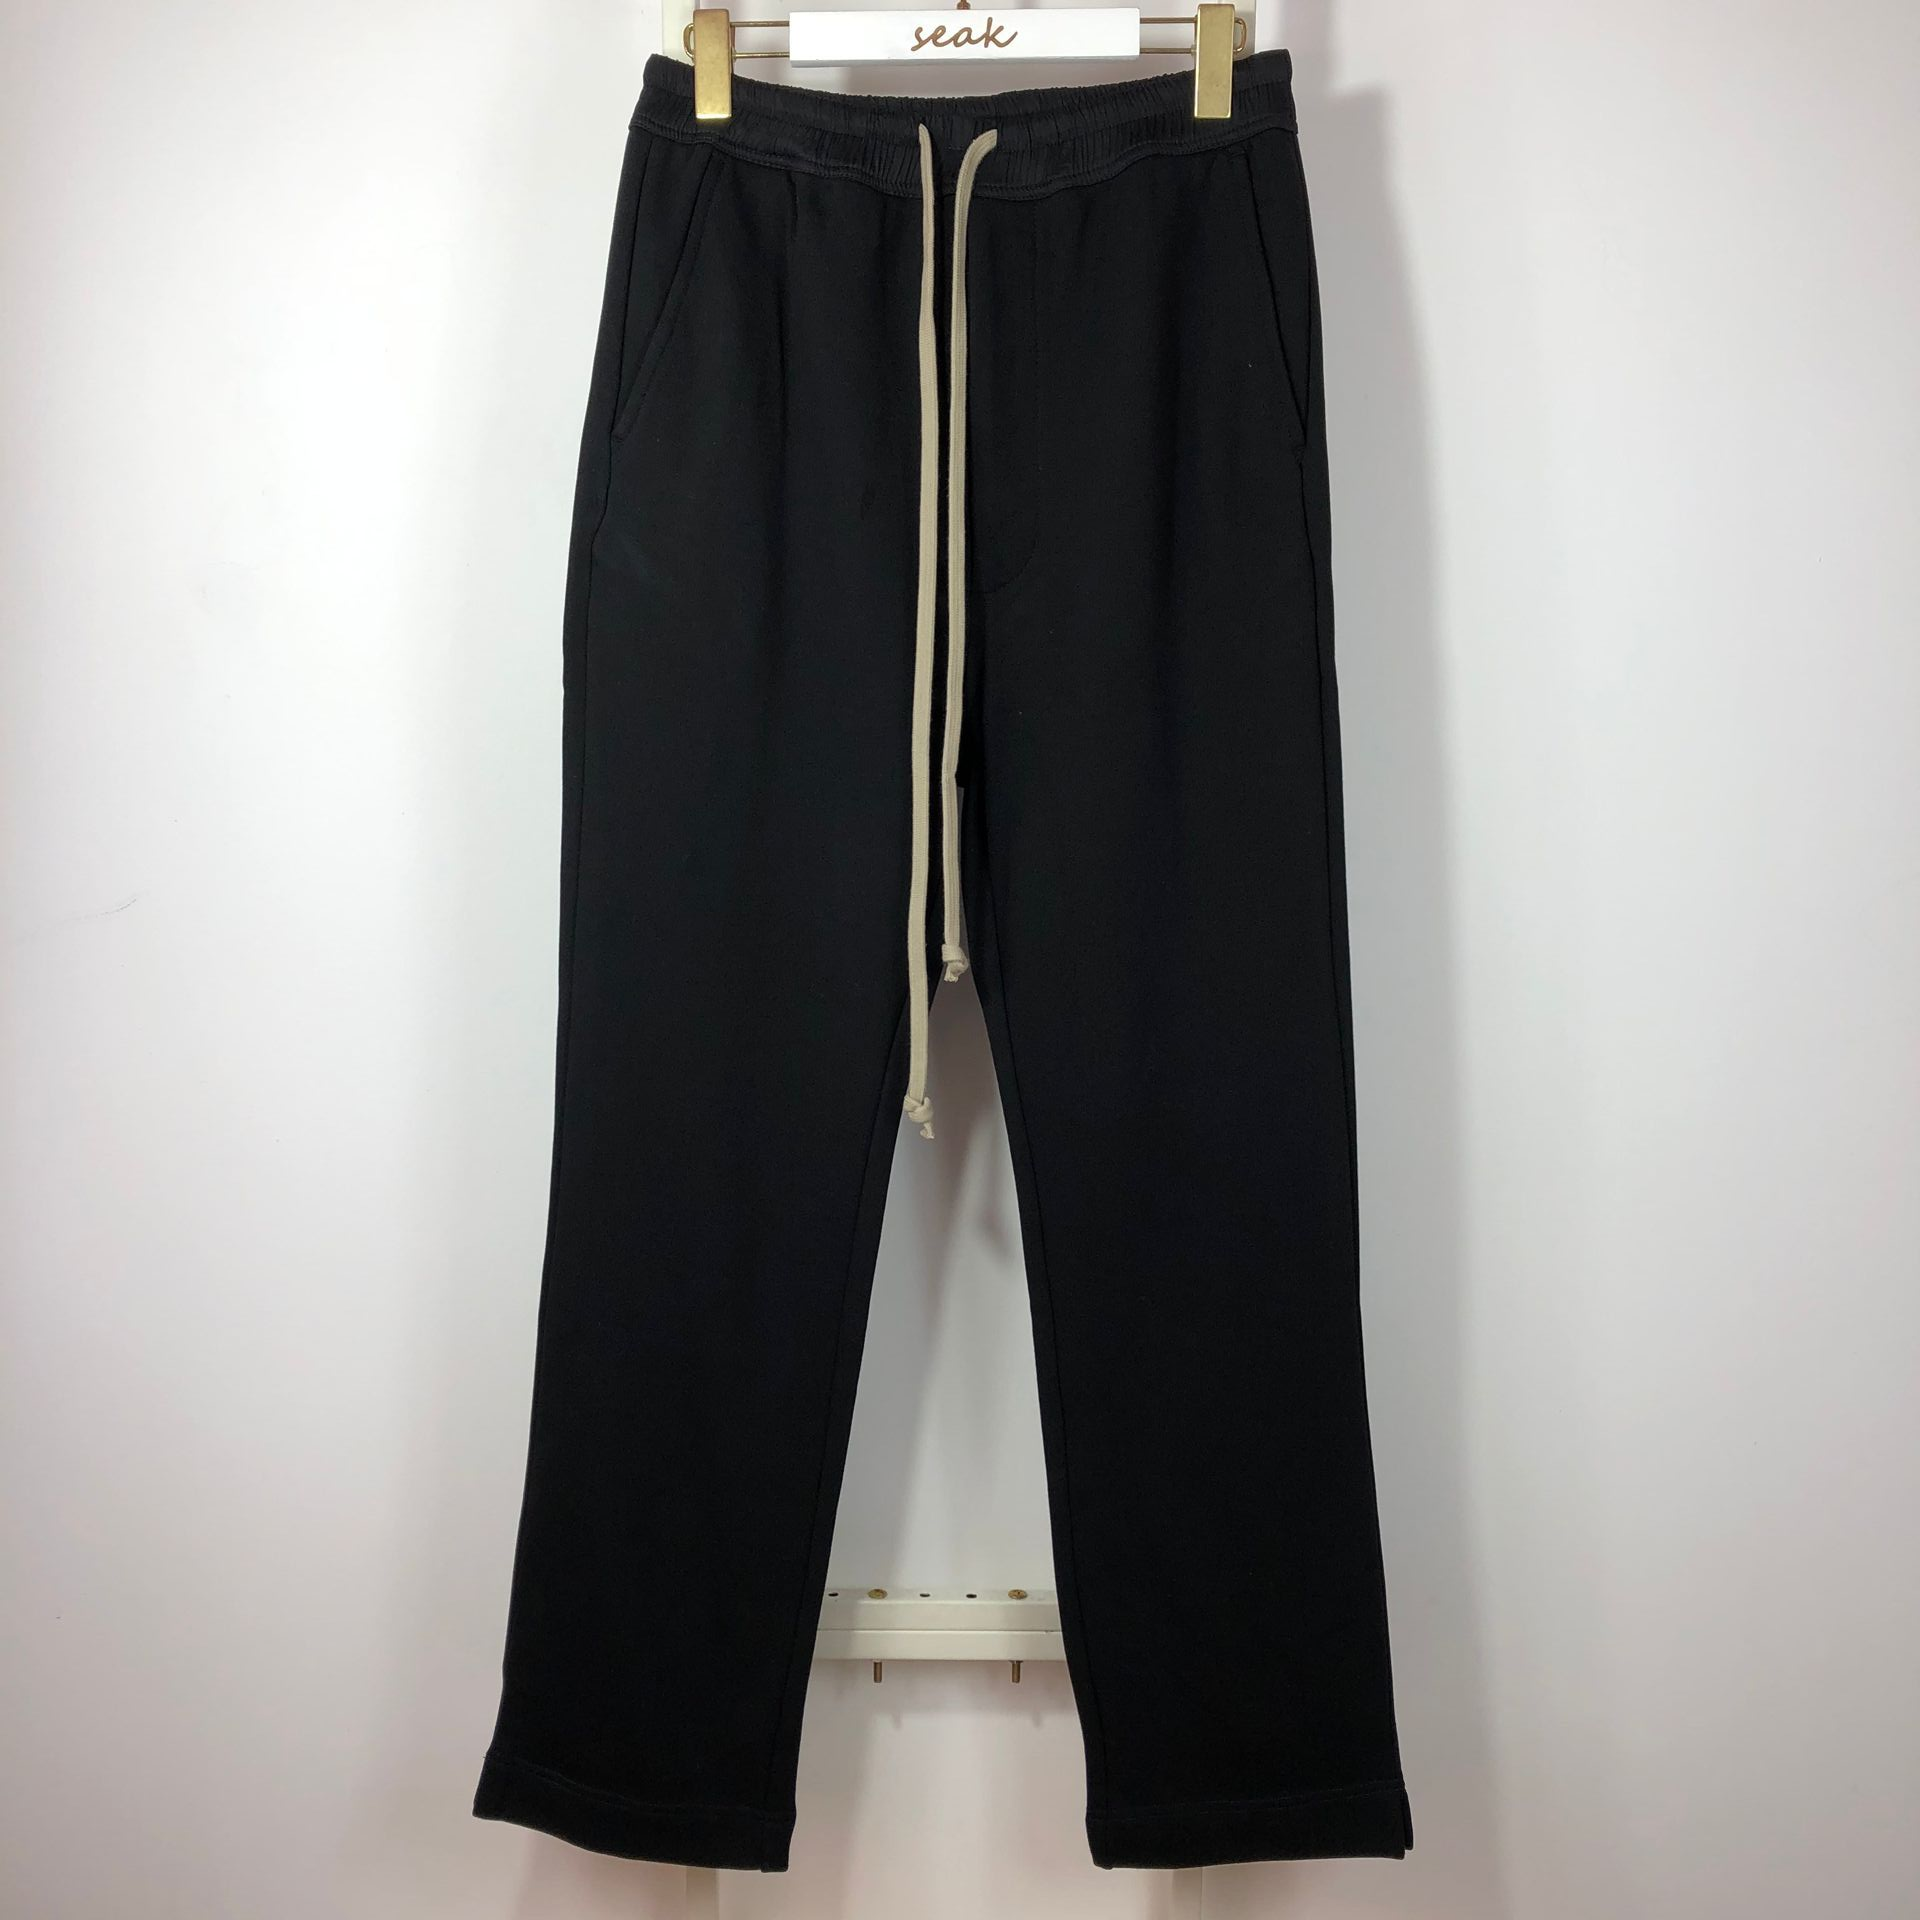 Owen Seak Men Casual Cross Pants Gothic Length Cargo Men's Clothing Sweatpants Autumn Winter Women Harem Black Long  Pants